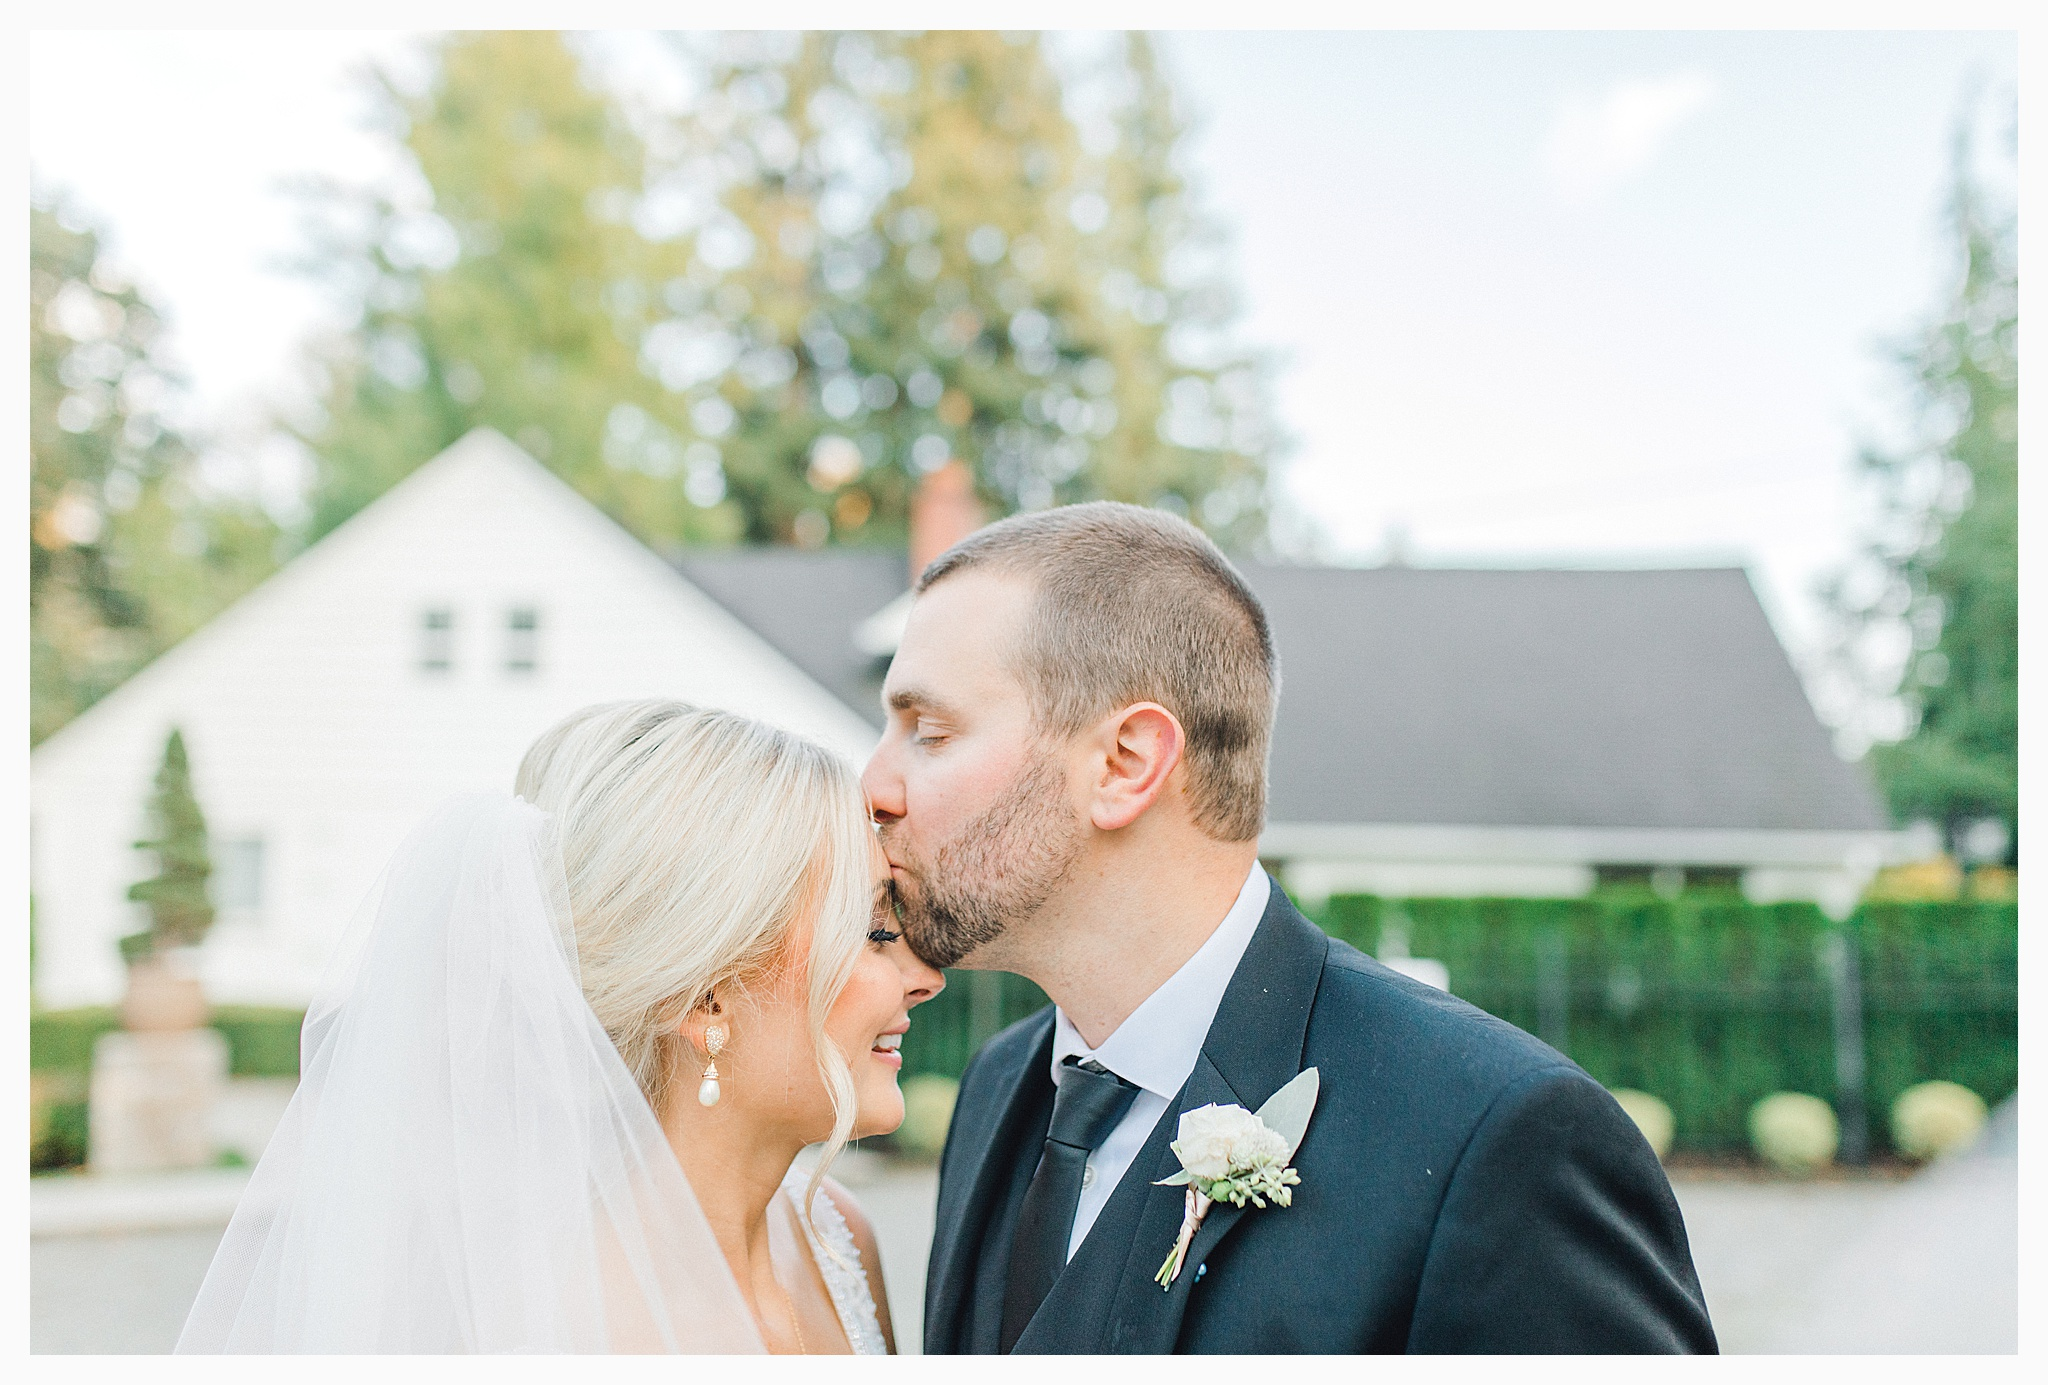 Emma Rose Company Light and Airy Wedding Photographer, Beautiful fall wedding at Rock Creek Gardens Venue in Puyallup, Washington._0088.jpg